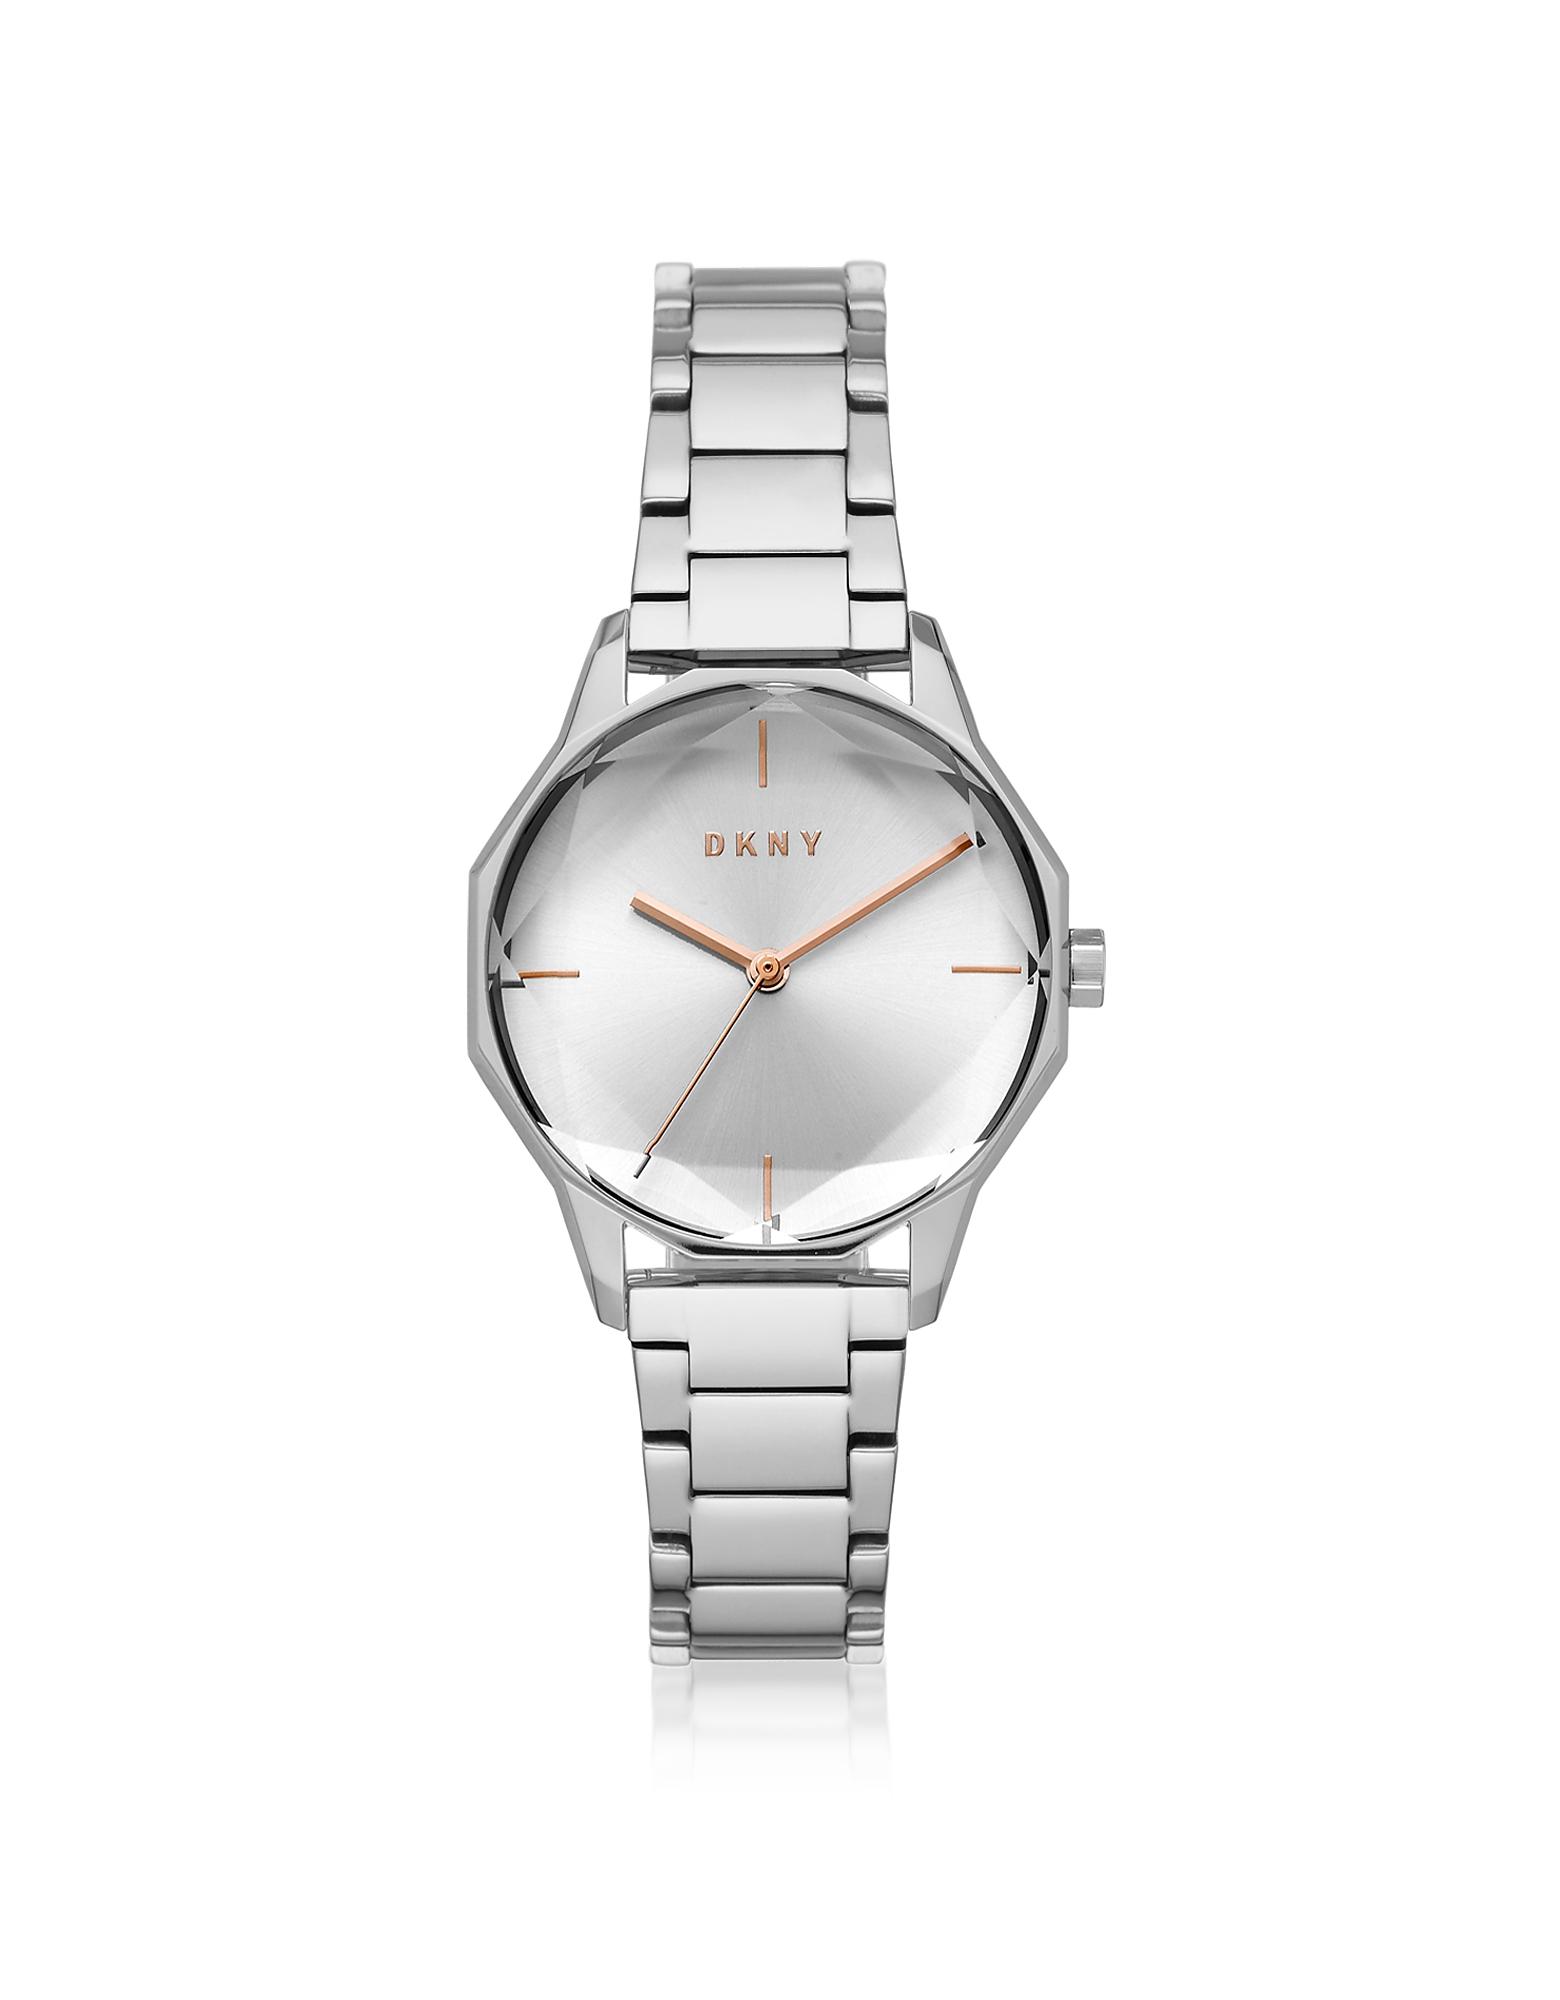 Cityspire - Круглый Часы из Нержавеющей Стали DKNY